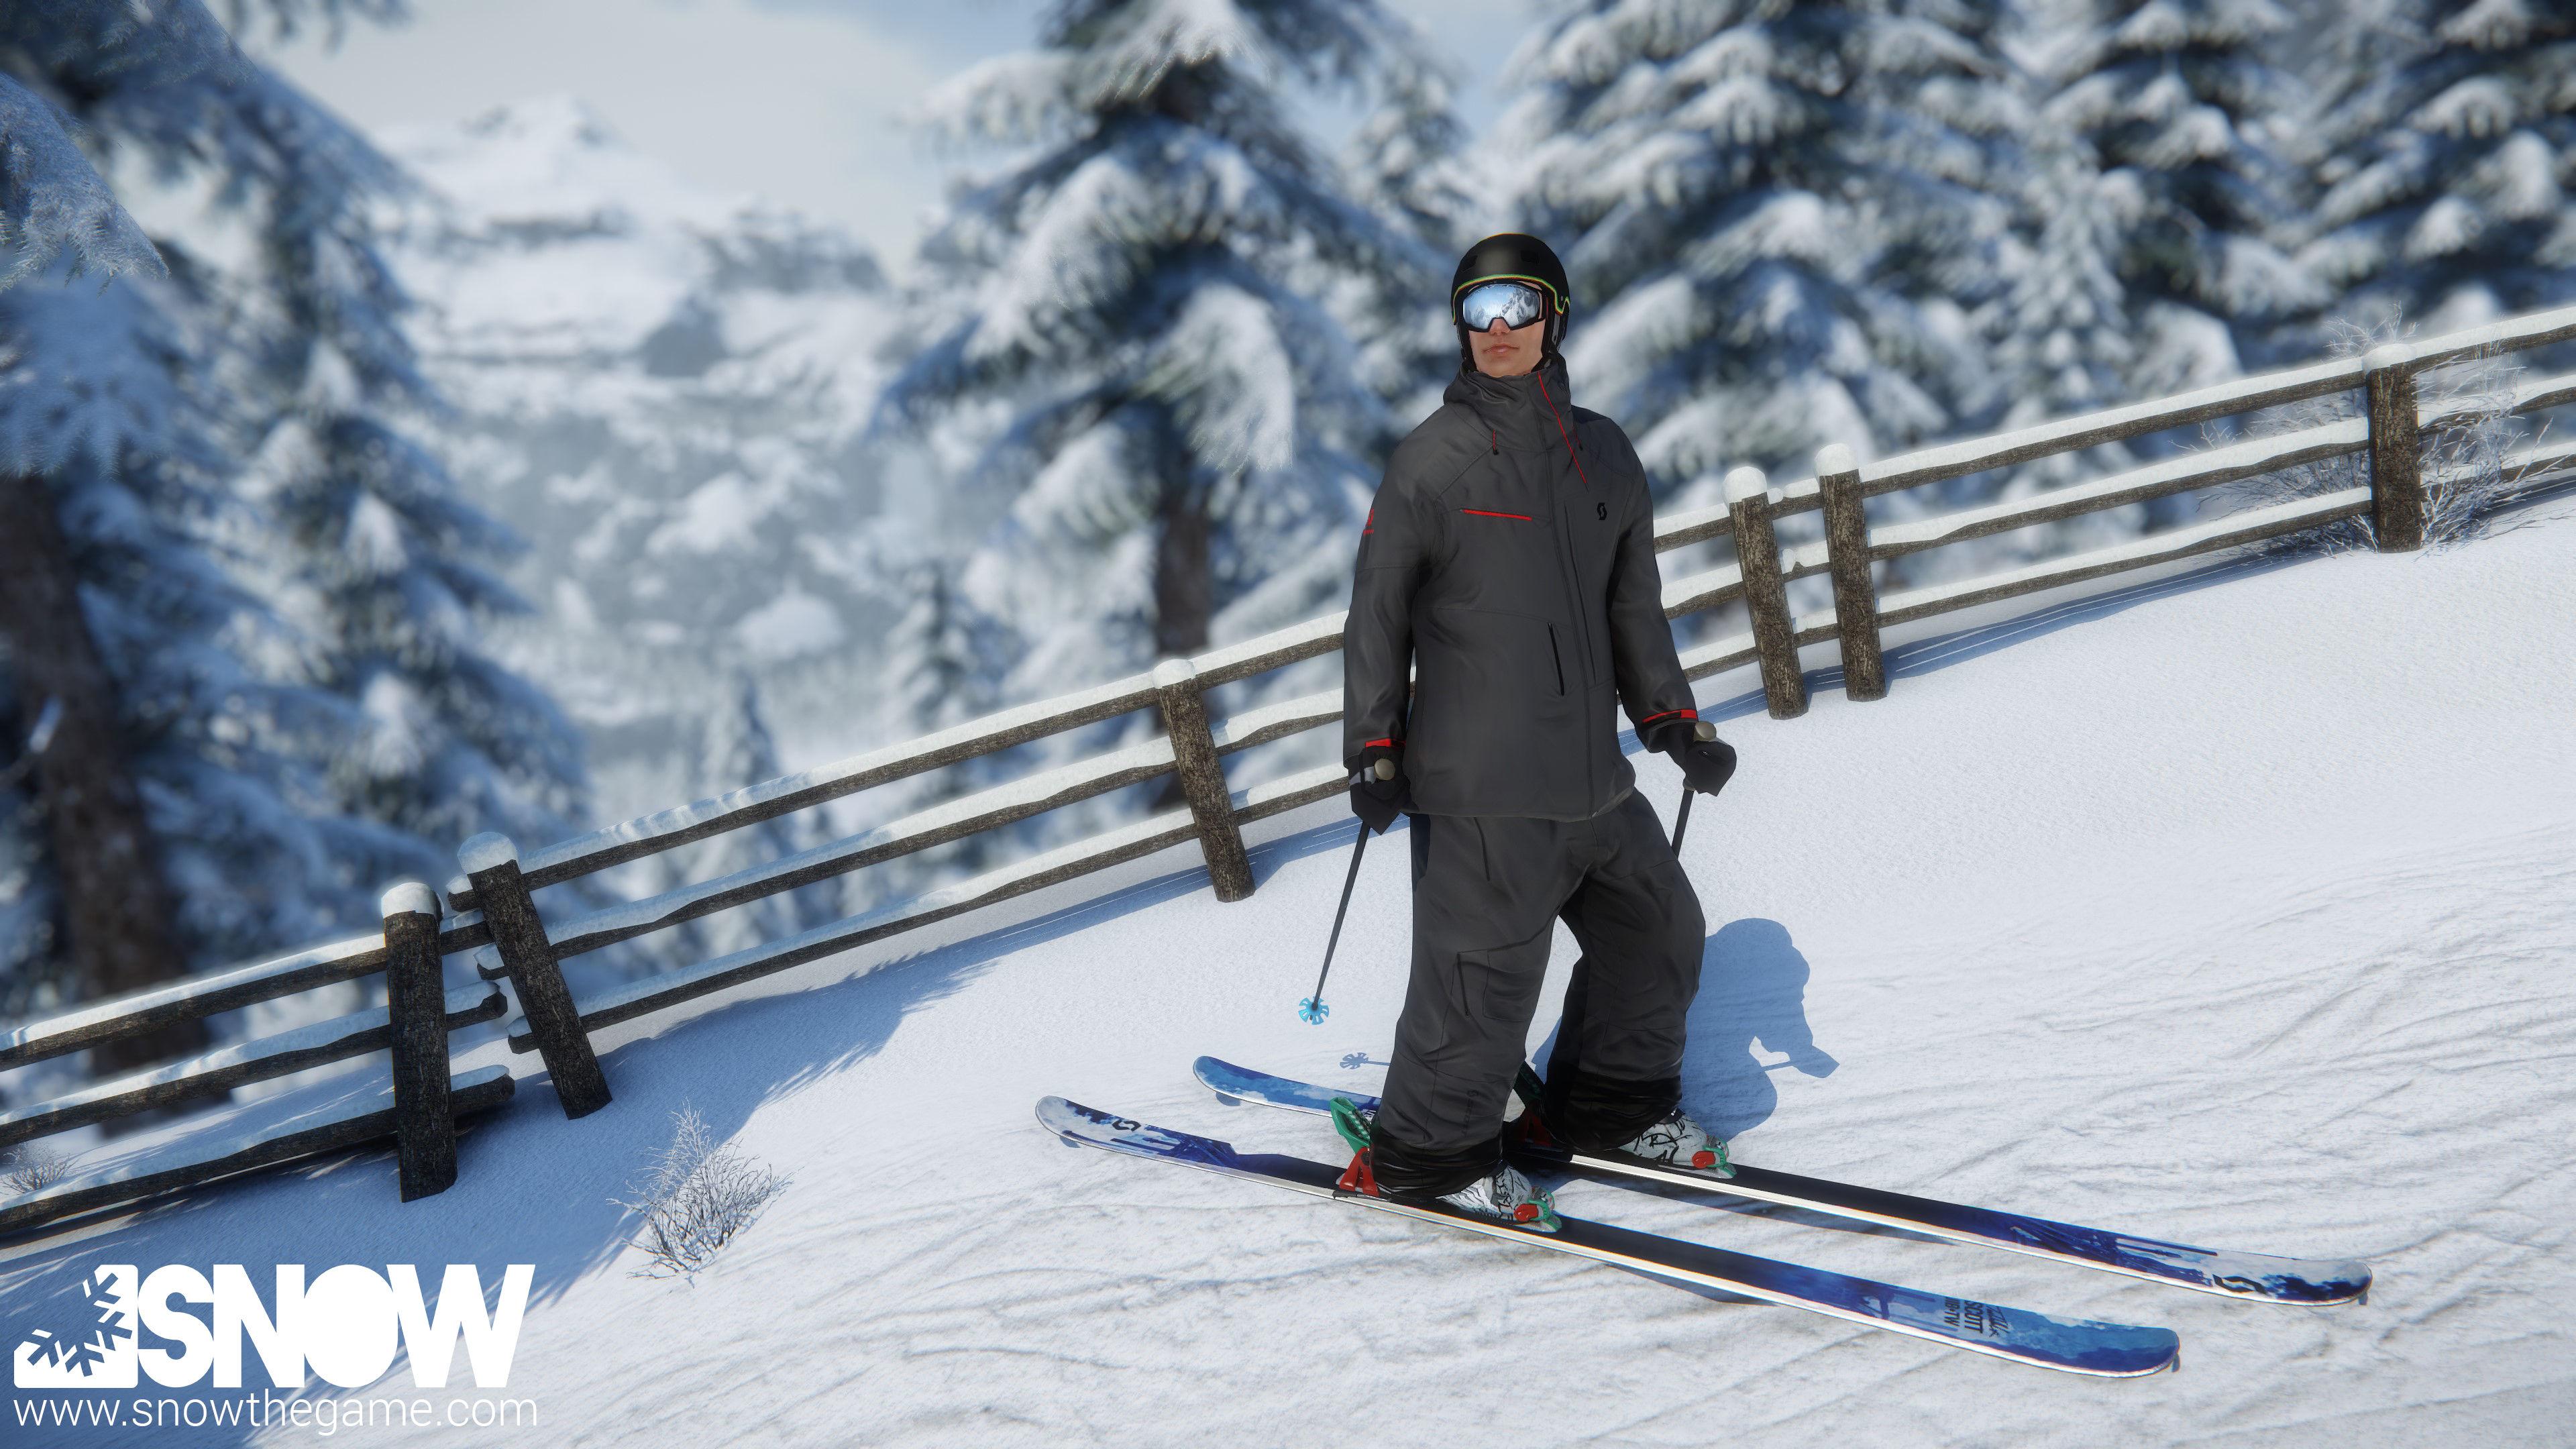 Nové obrázky z adrenalinového SNOW 88121